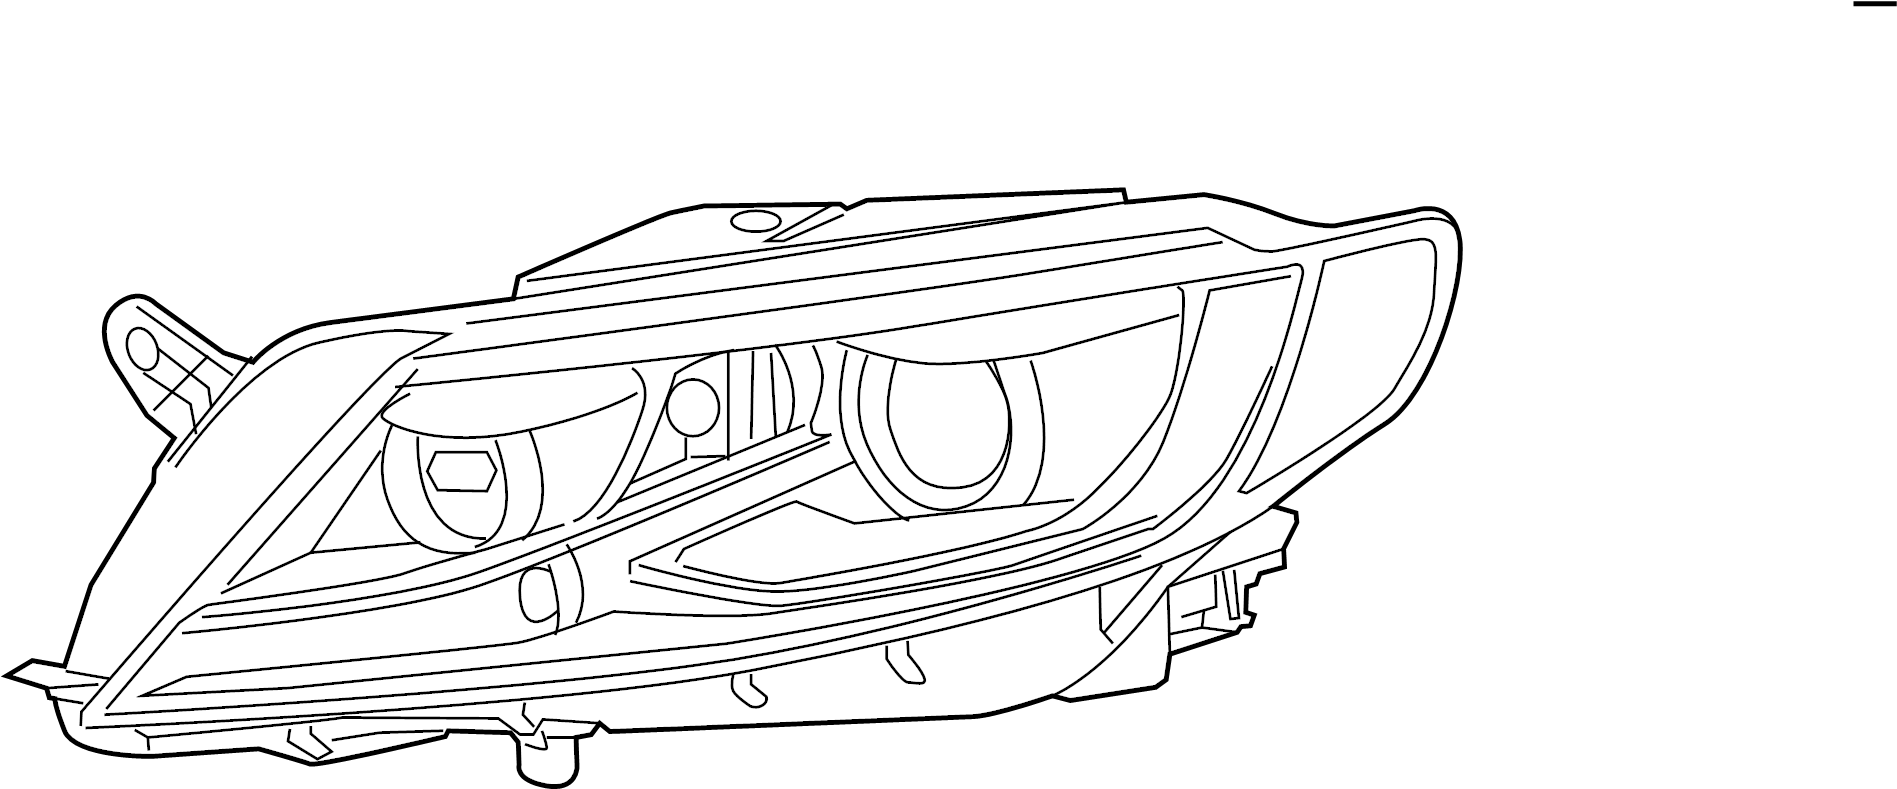 2016 Volkswagen CC Headlight Assembly. 2013-2017, W/LED